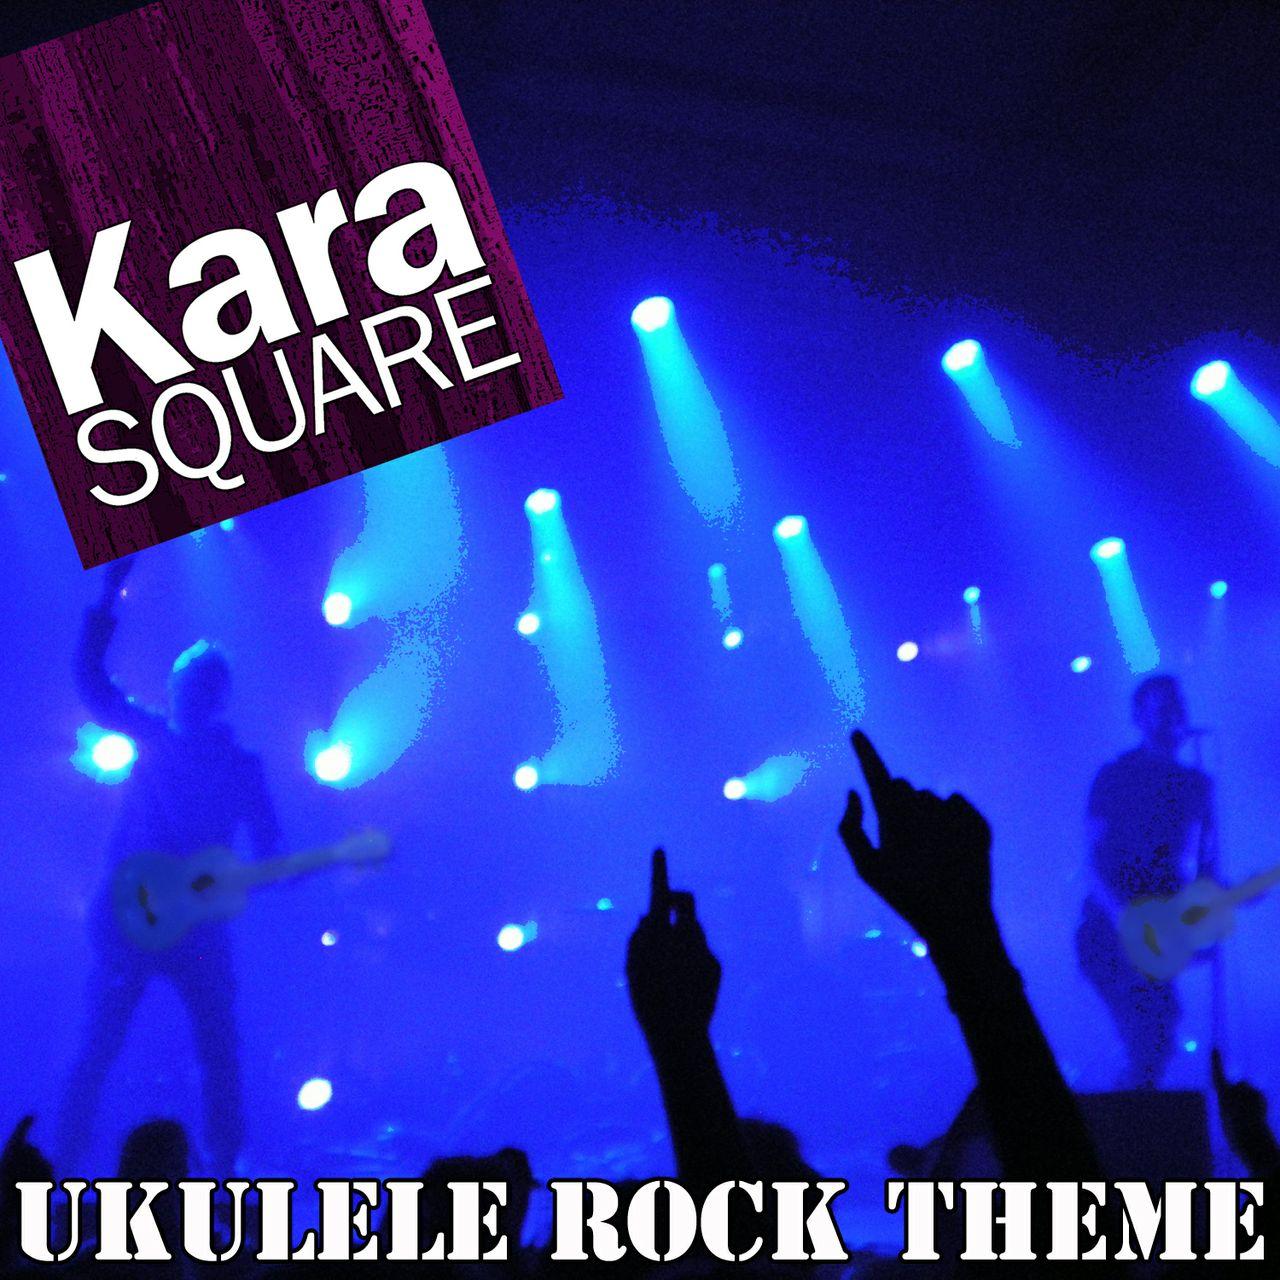 License/Zip Pack - Project Budget $0-500 Ukulele Rock Theme